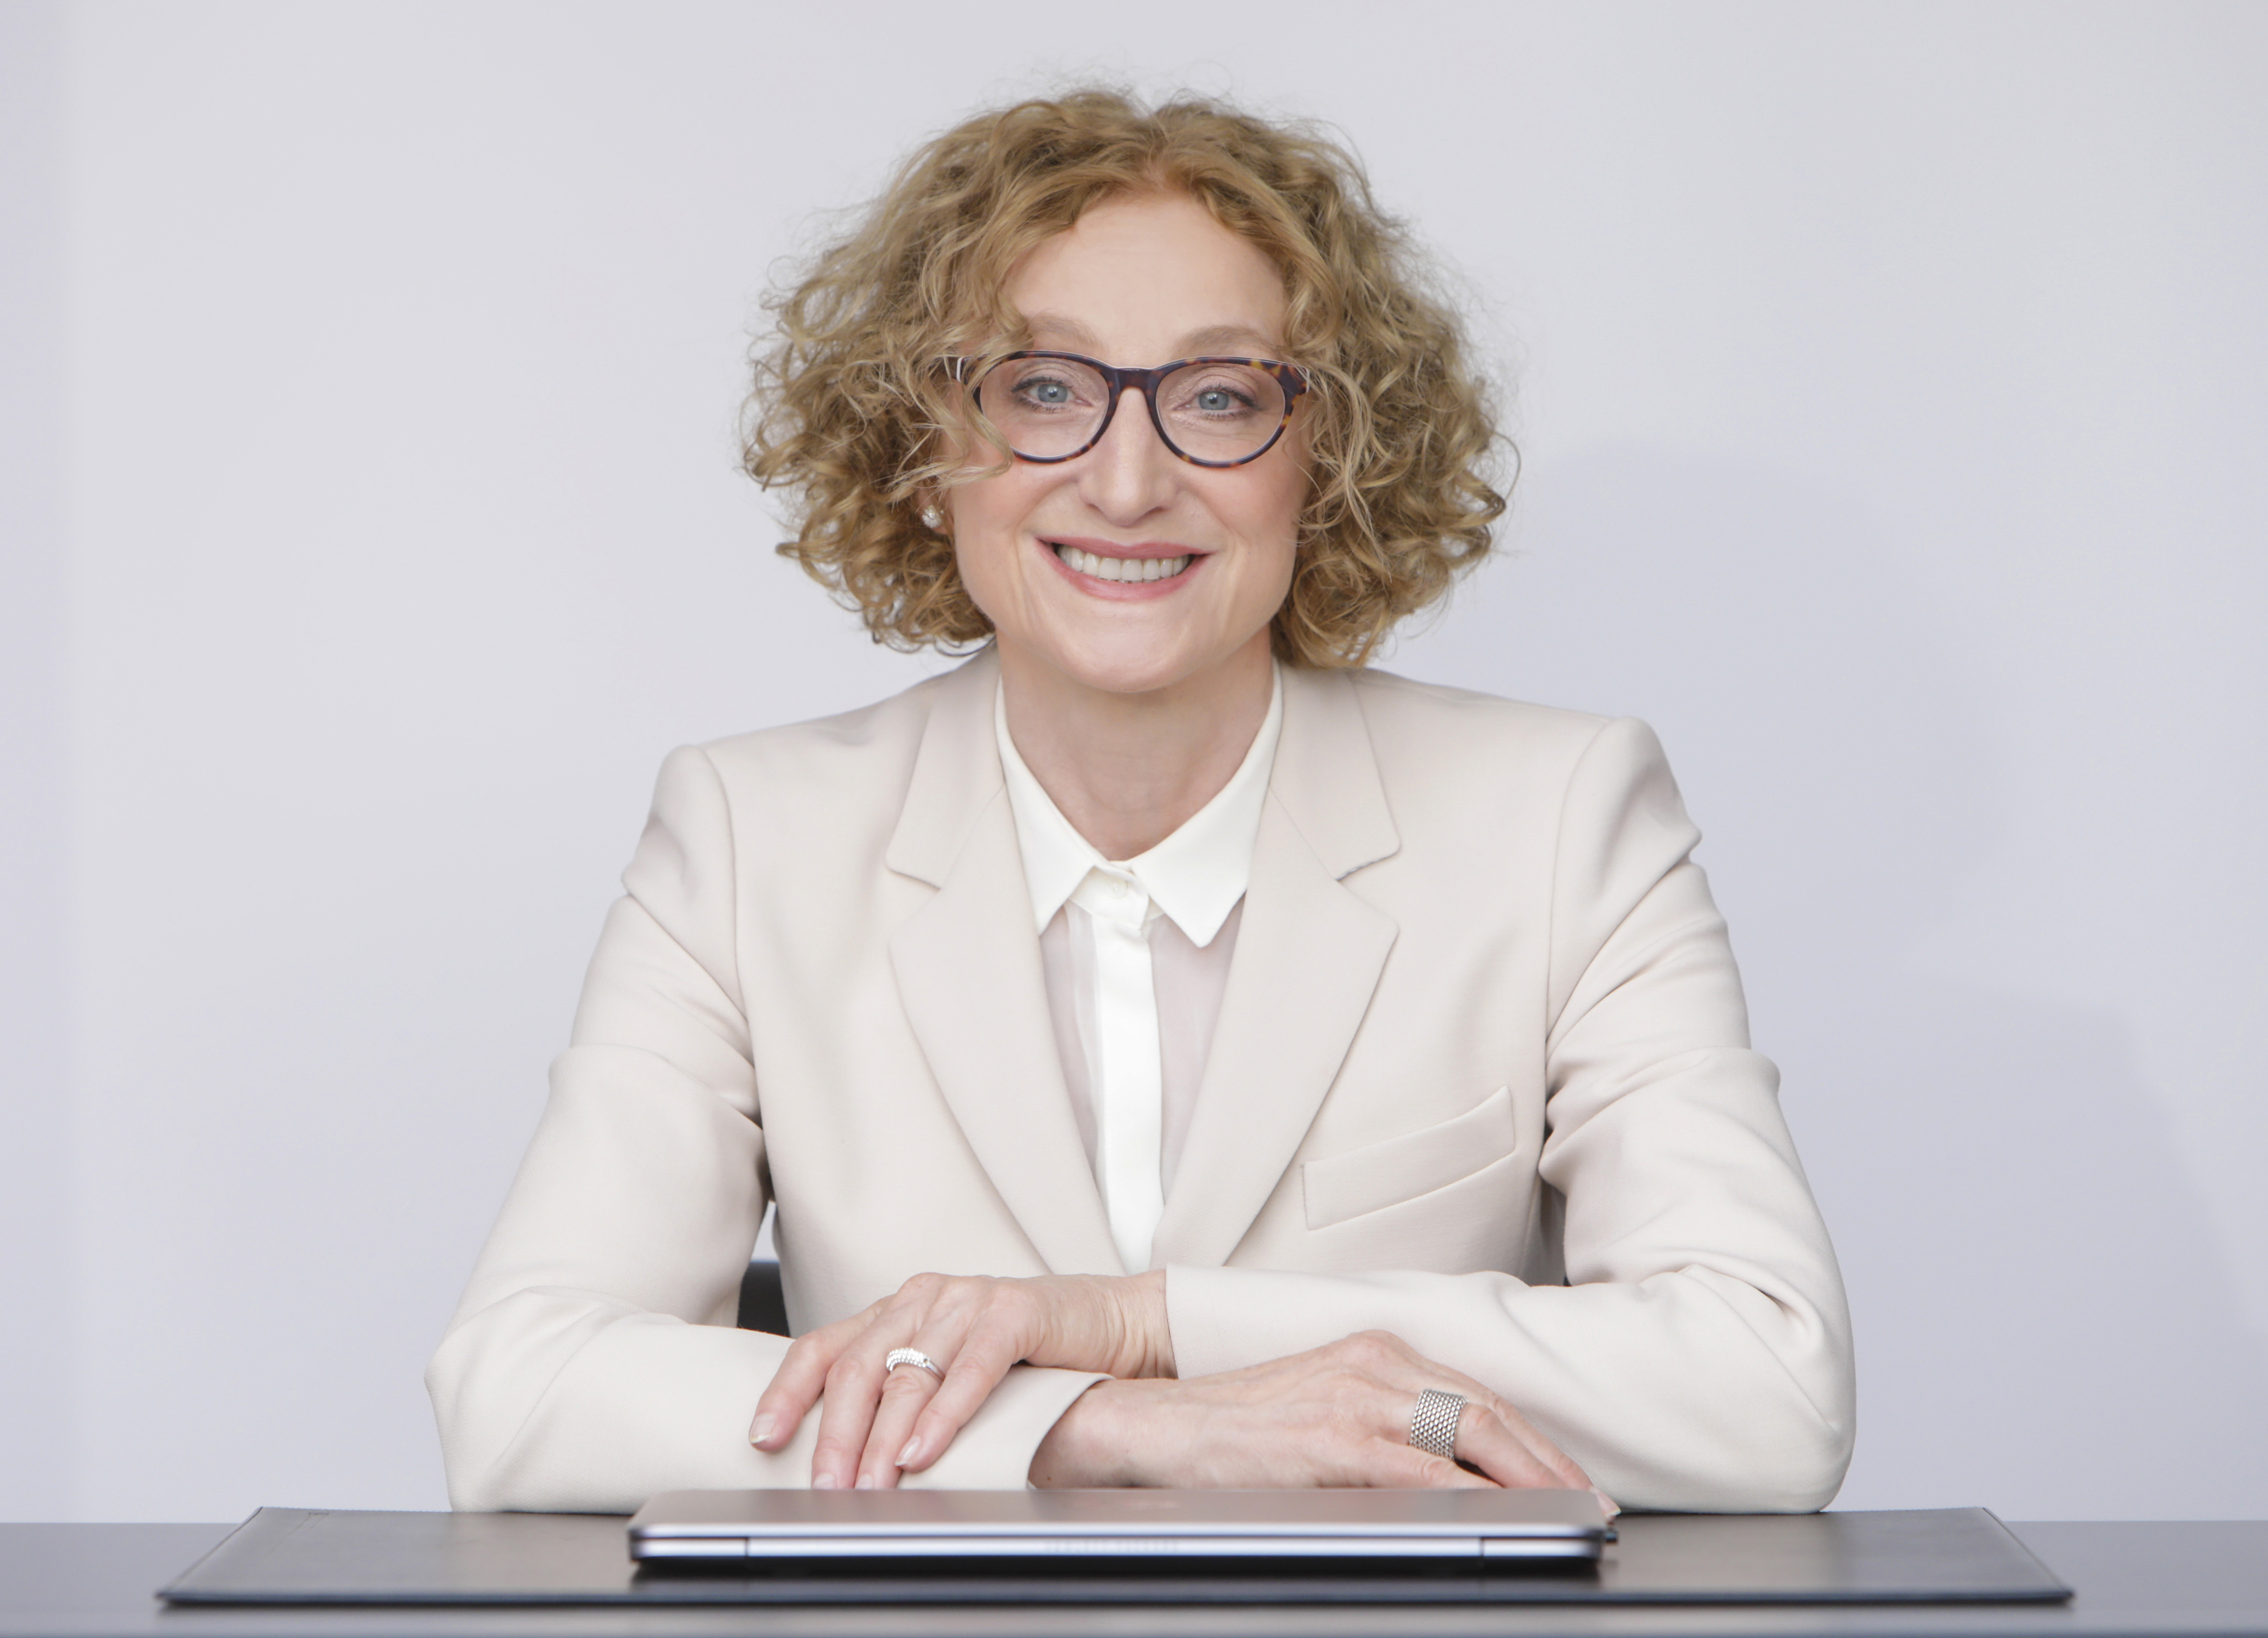 Jivka Ovtcharova